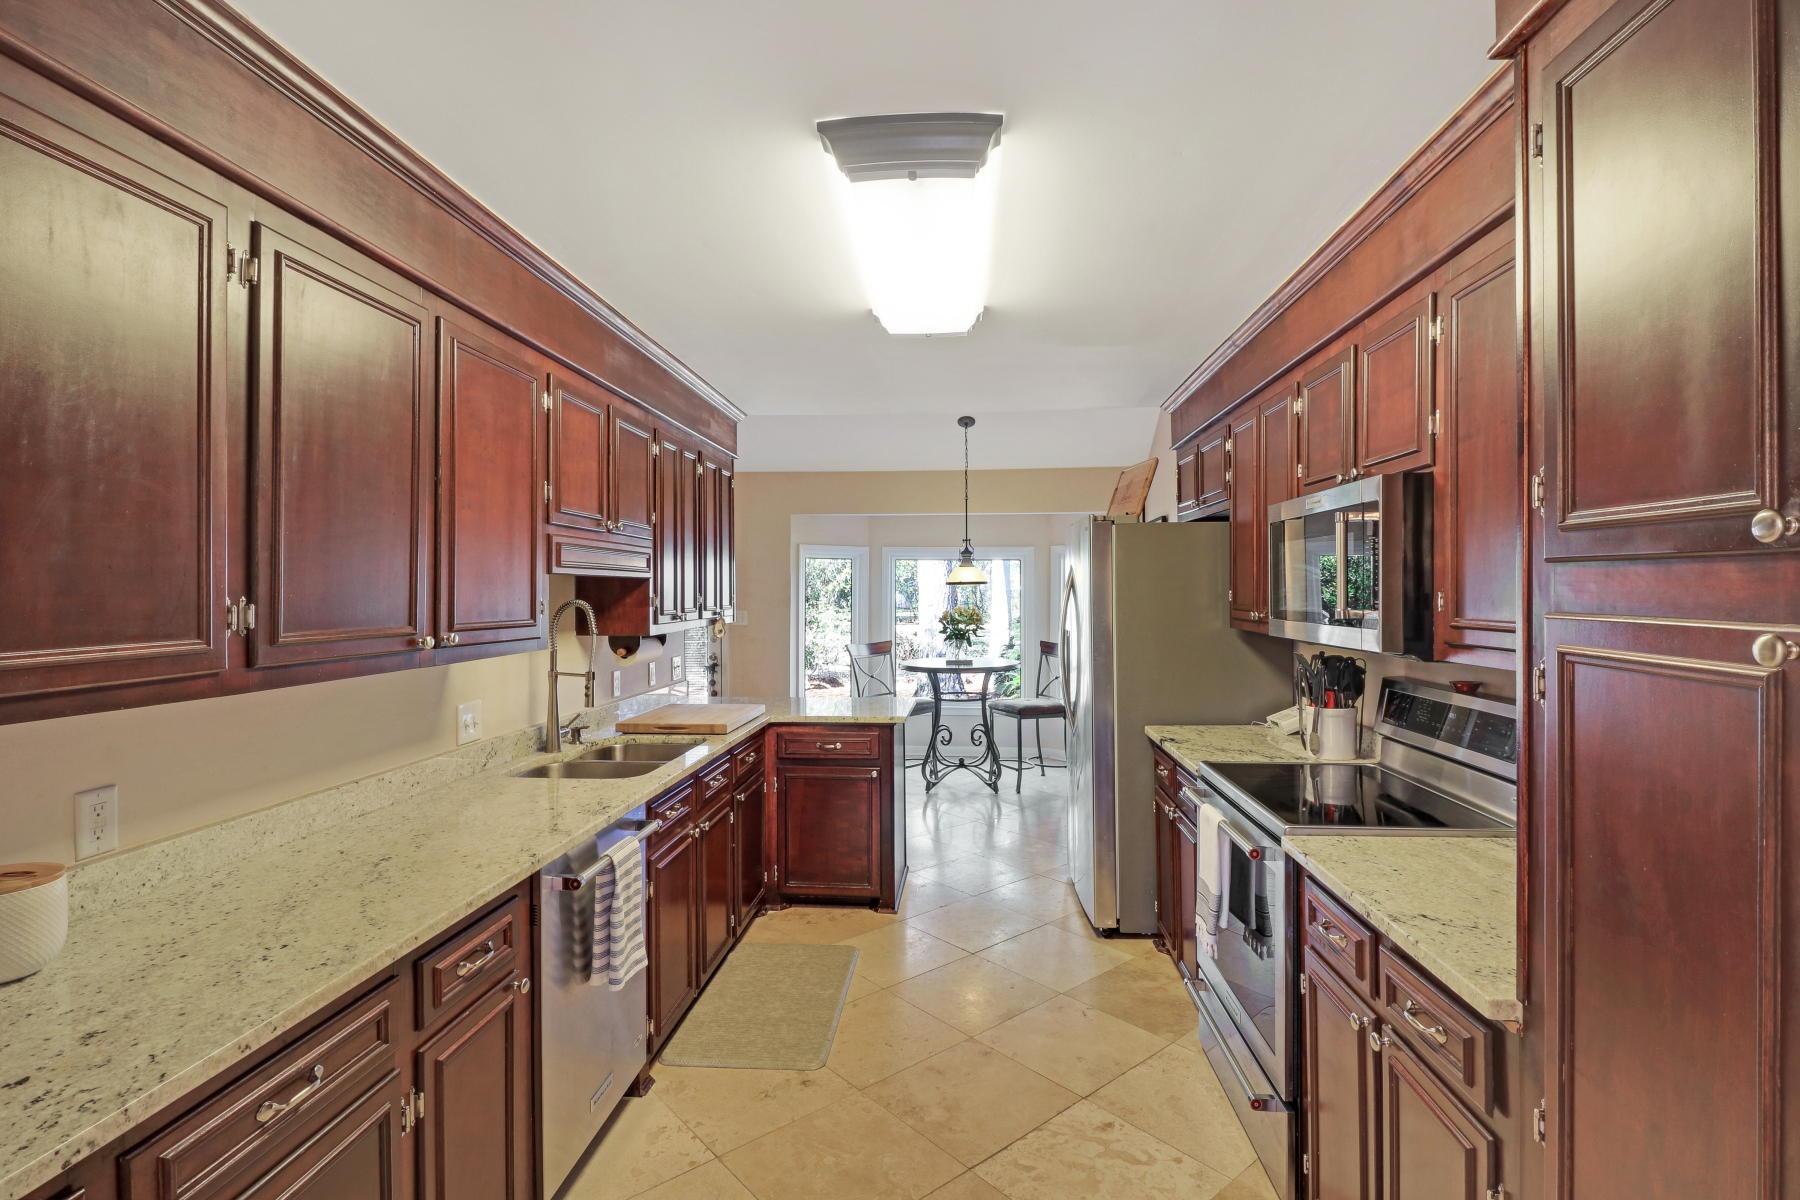 Harrison Acres Homes For Sale - 51 Markfield, Charleston, SC - 8